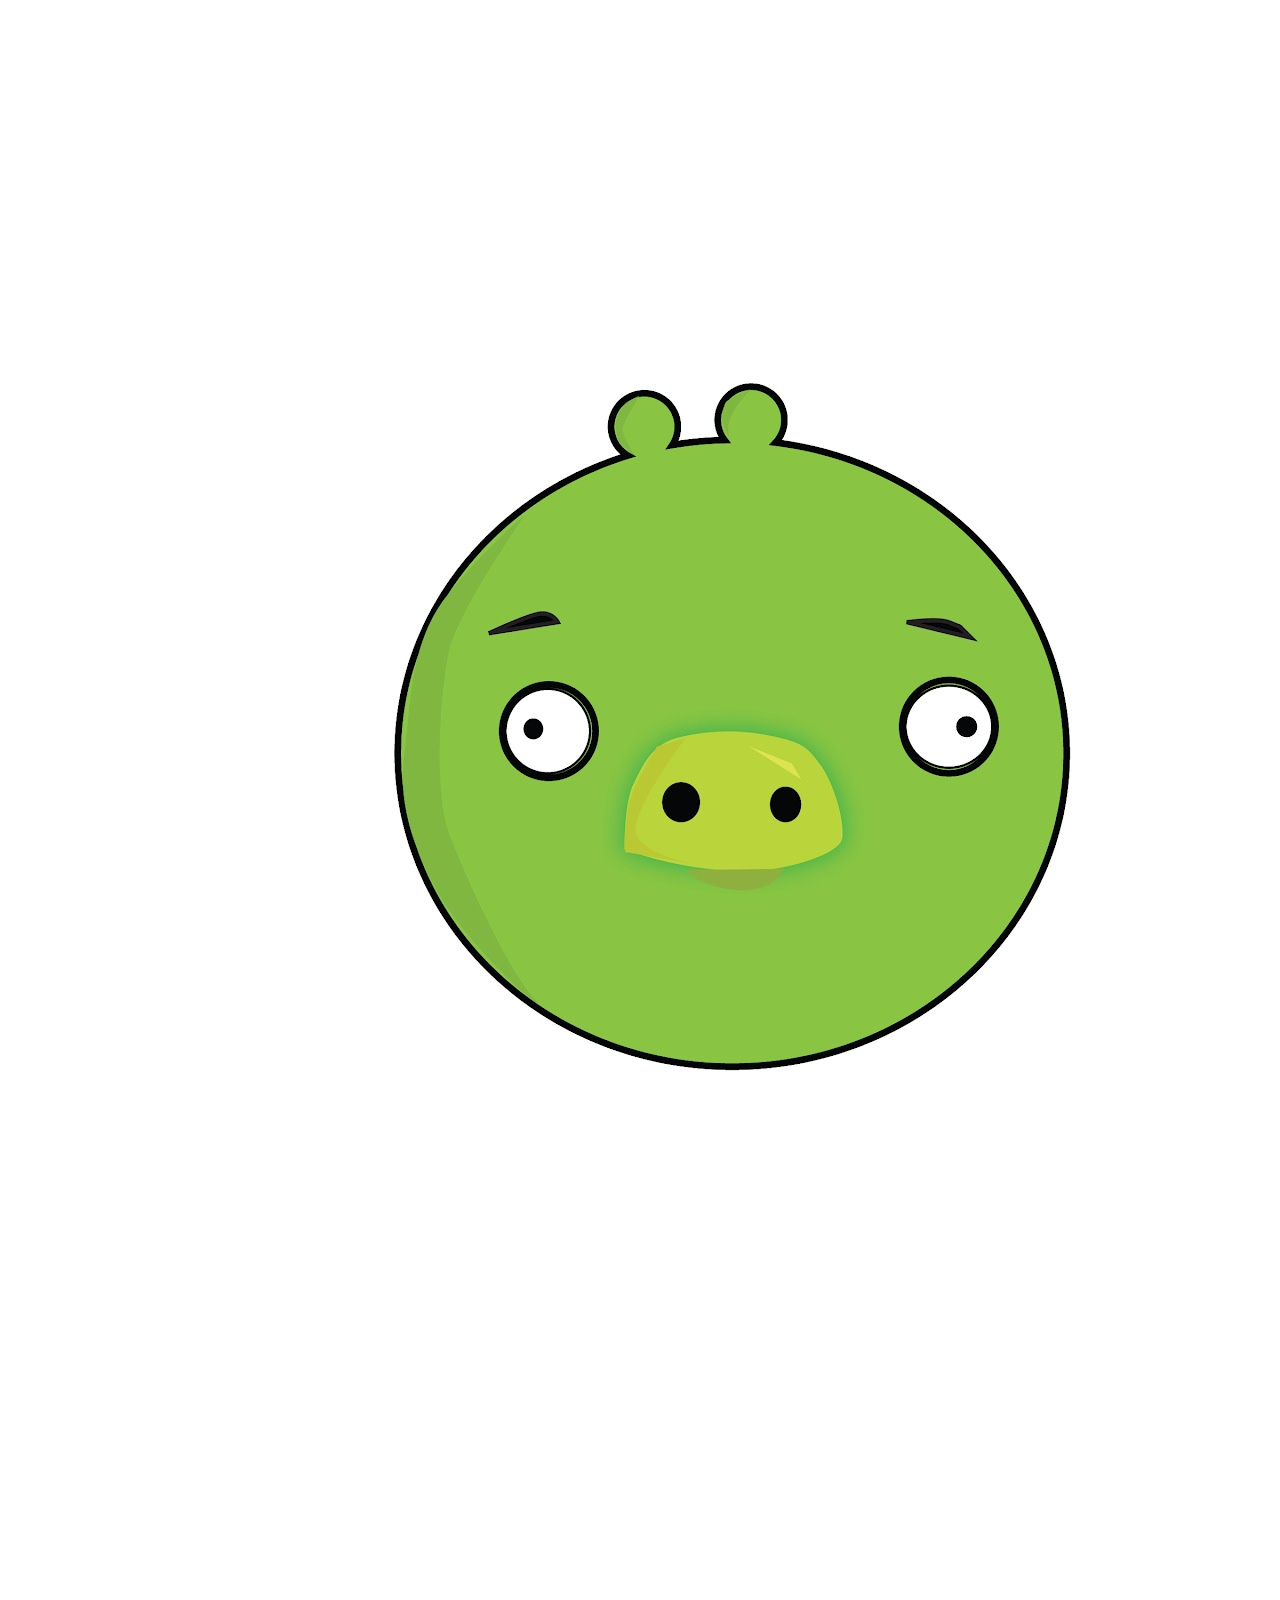 juancarlossalas portfolio: green pig from angry birds illustrator